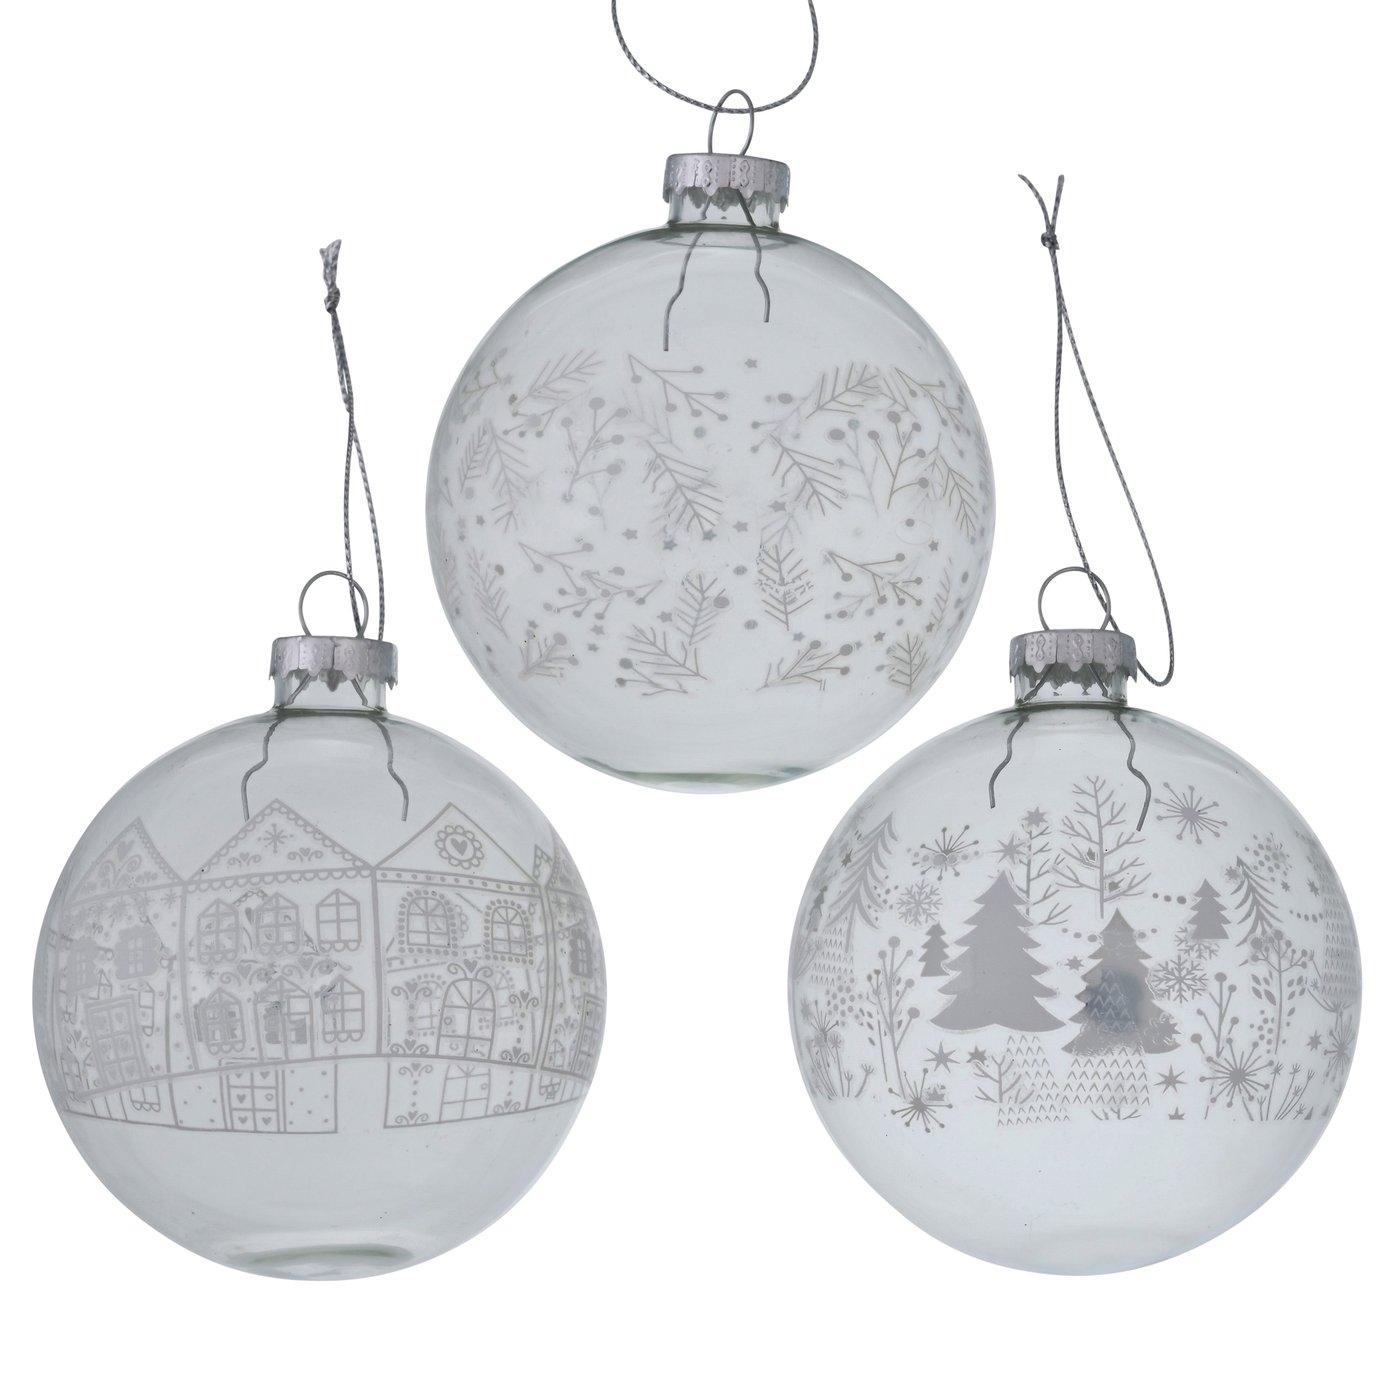 "Weihnachtskugeln ""Winter"" 3er-Set"